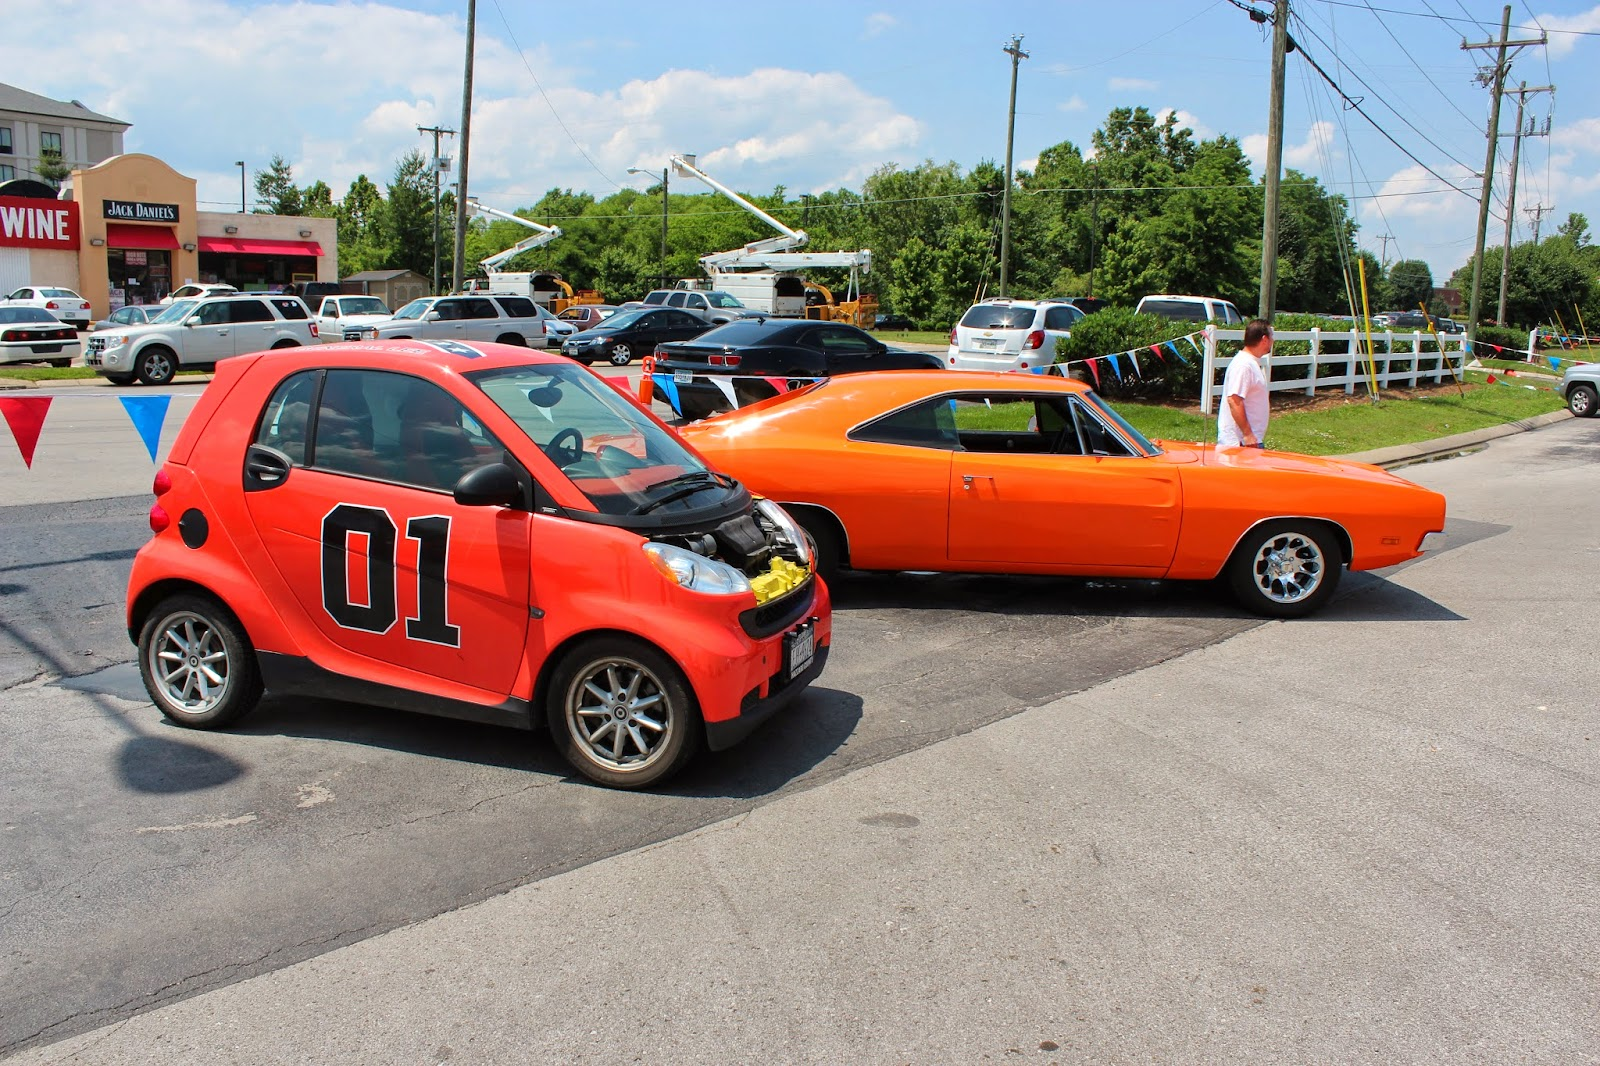 Bed Liner Spray >> Dukes of Hazzard Collector: Dukes of Hazzard Fan Fair - The Hazzard Cars